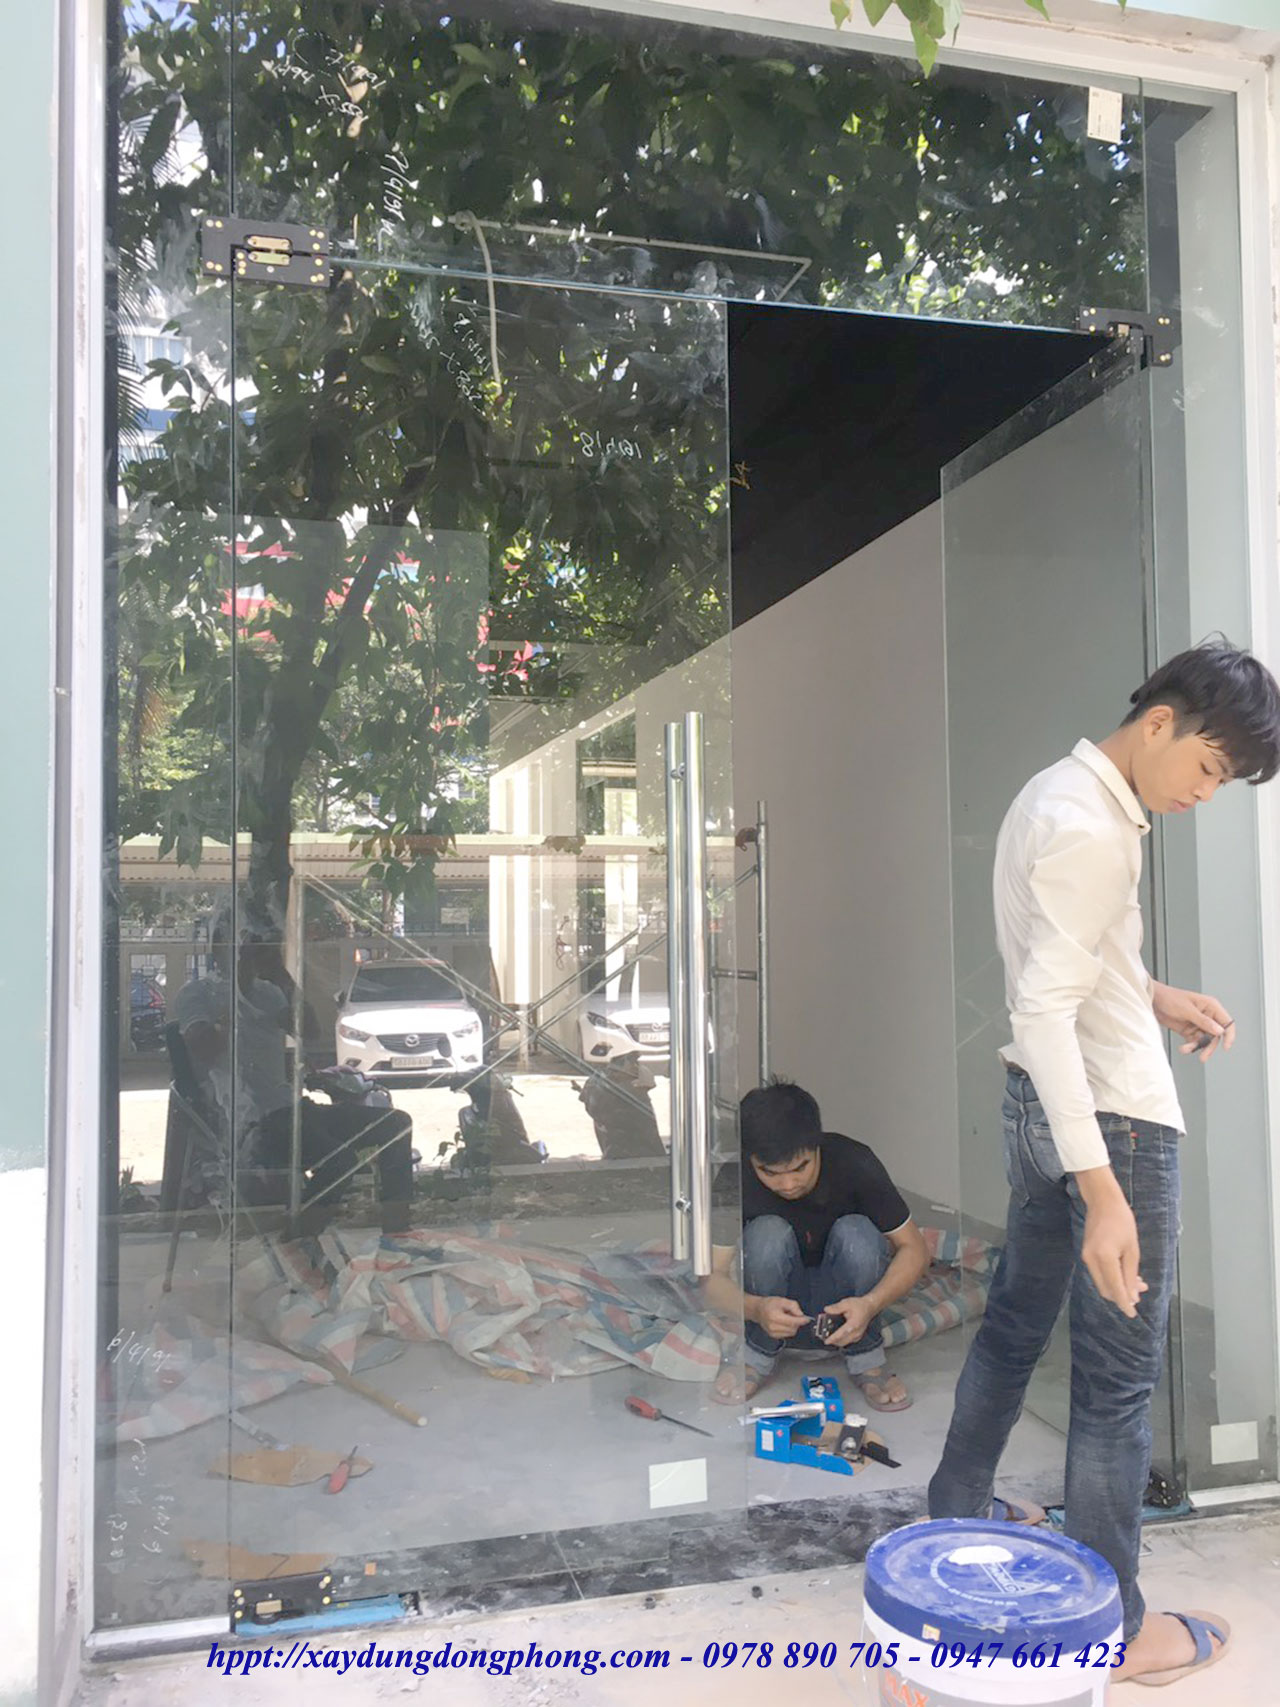 Cua Kinh Cuong Luc Mo Quay11